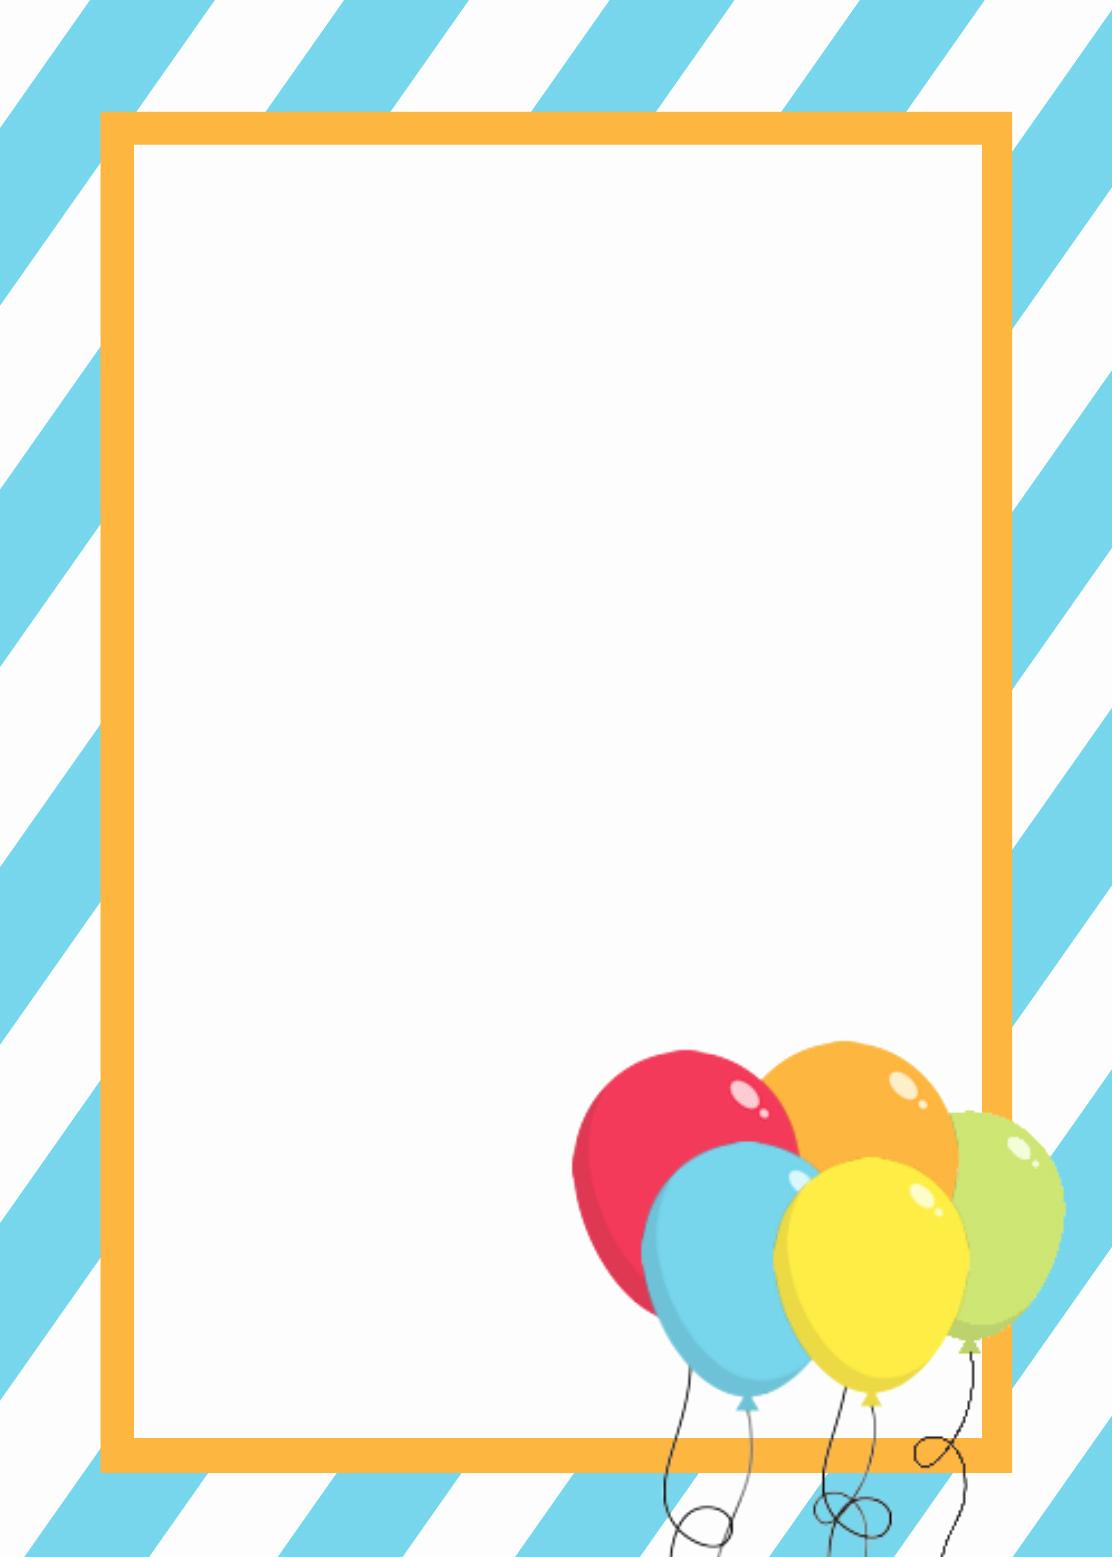 Microsoft Word Invitations Templates Luxury Free Printable Birthday Invitation Templates